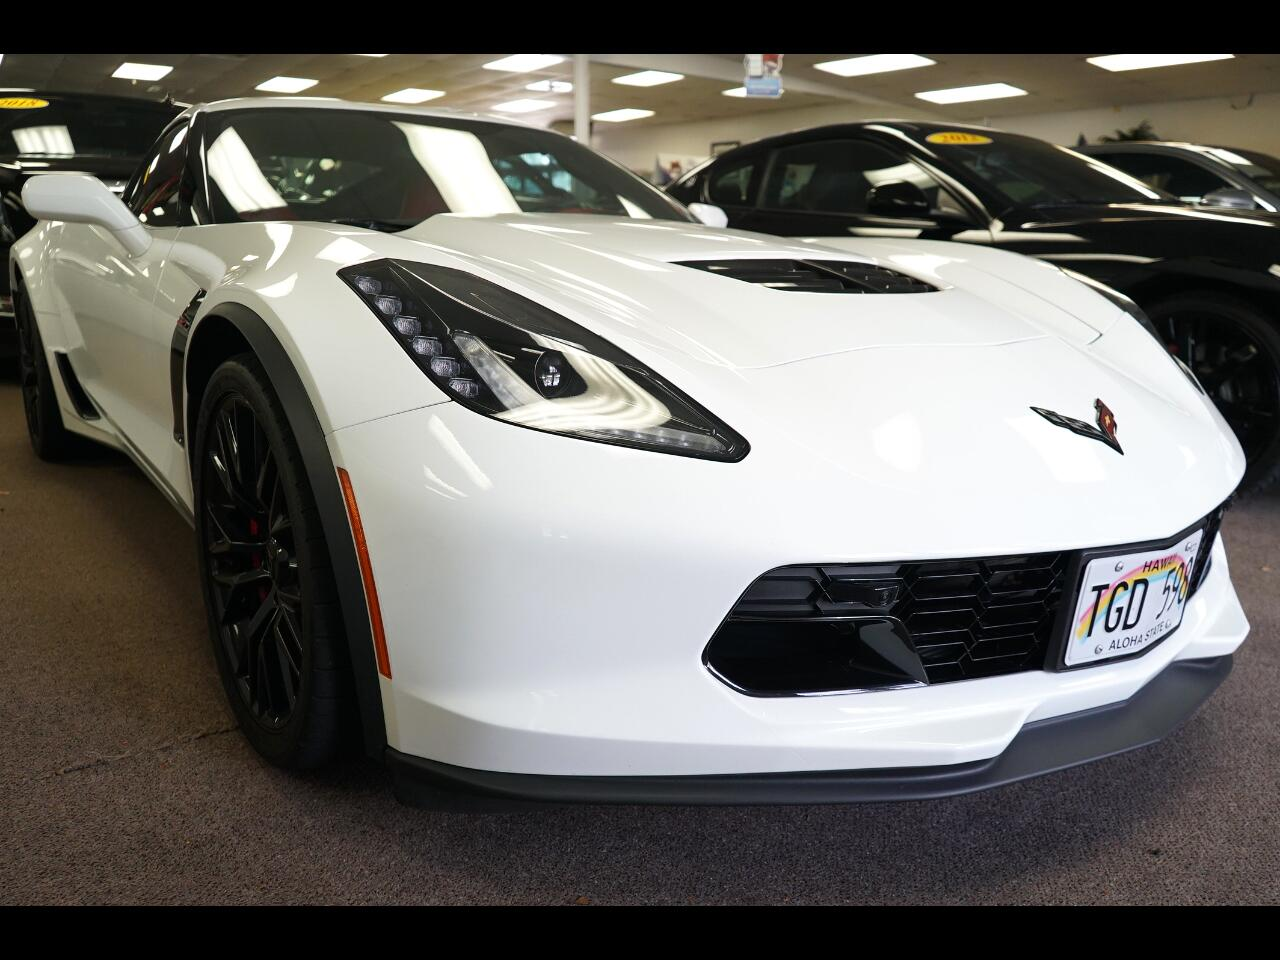 2016 Chevrolet Corvette 2dr Z06 Cpe w/2LZ